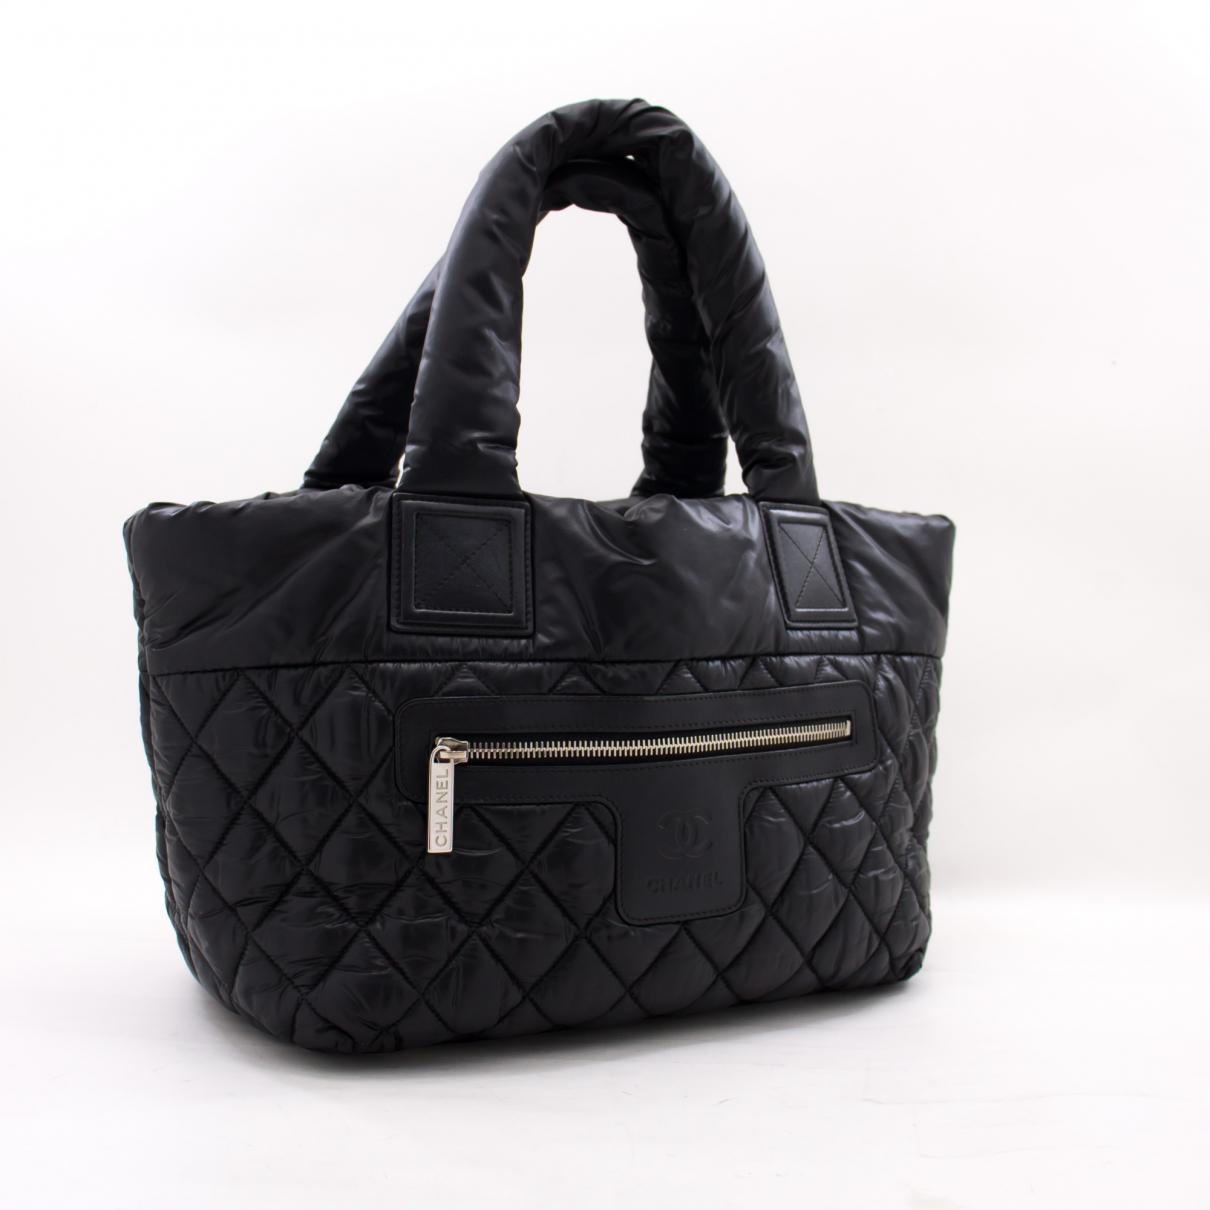 Chanel \N Handtasche in  Schwarz Synthetik